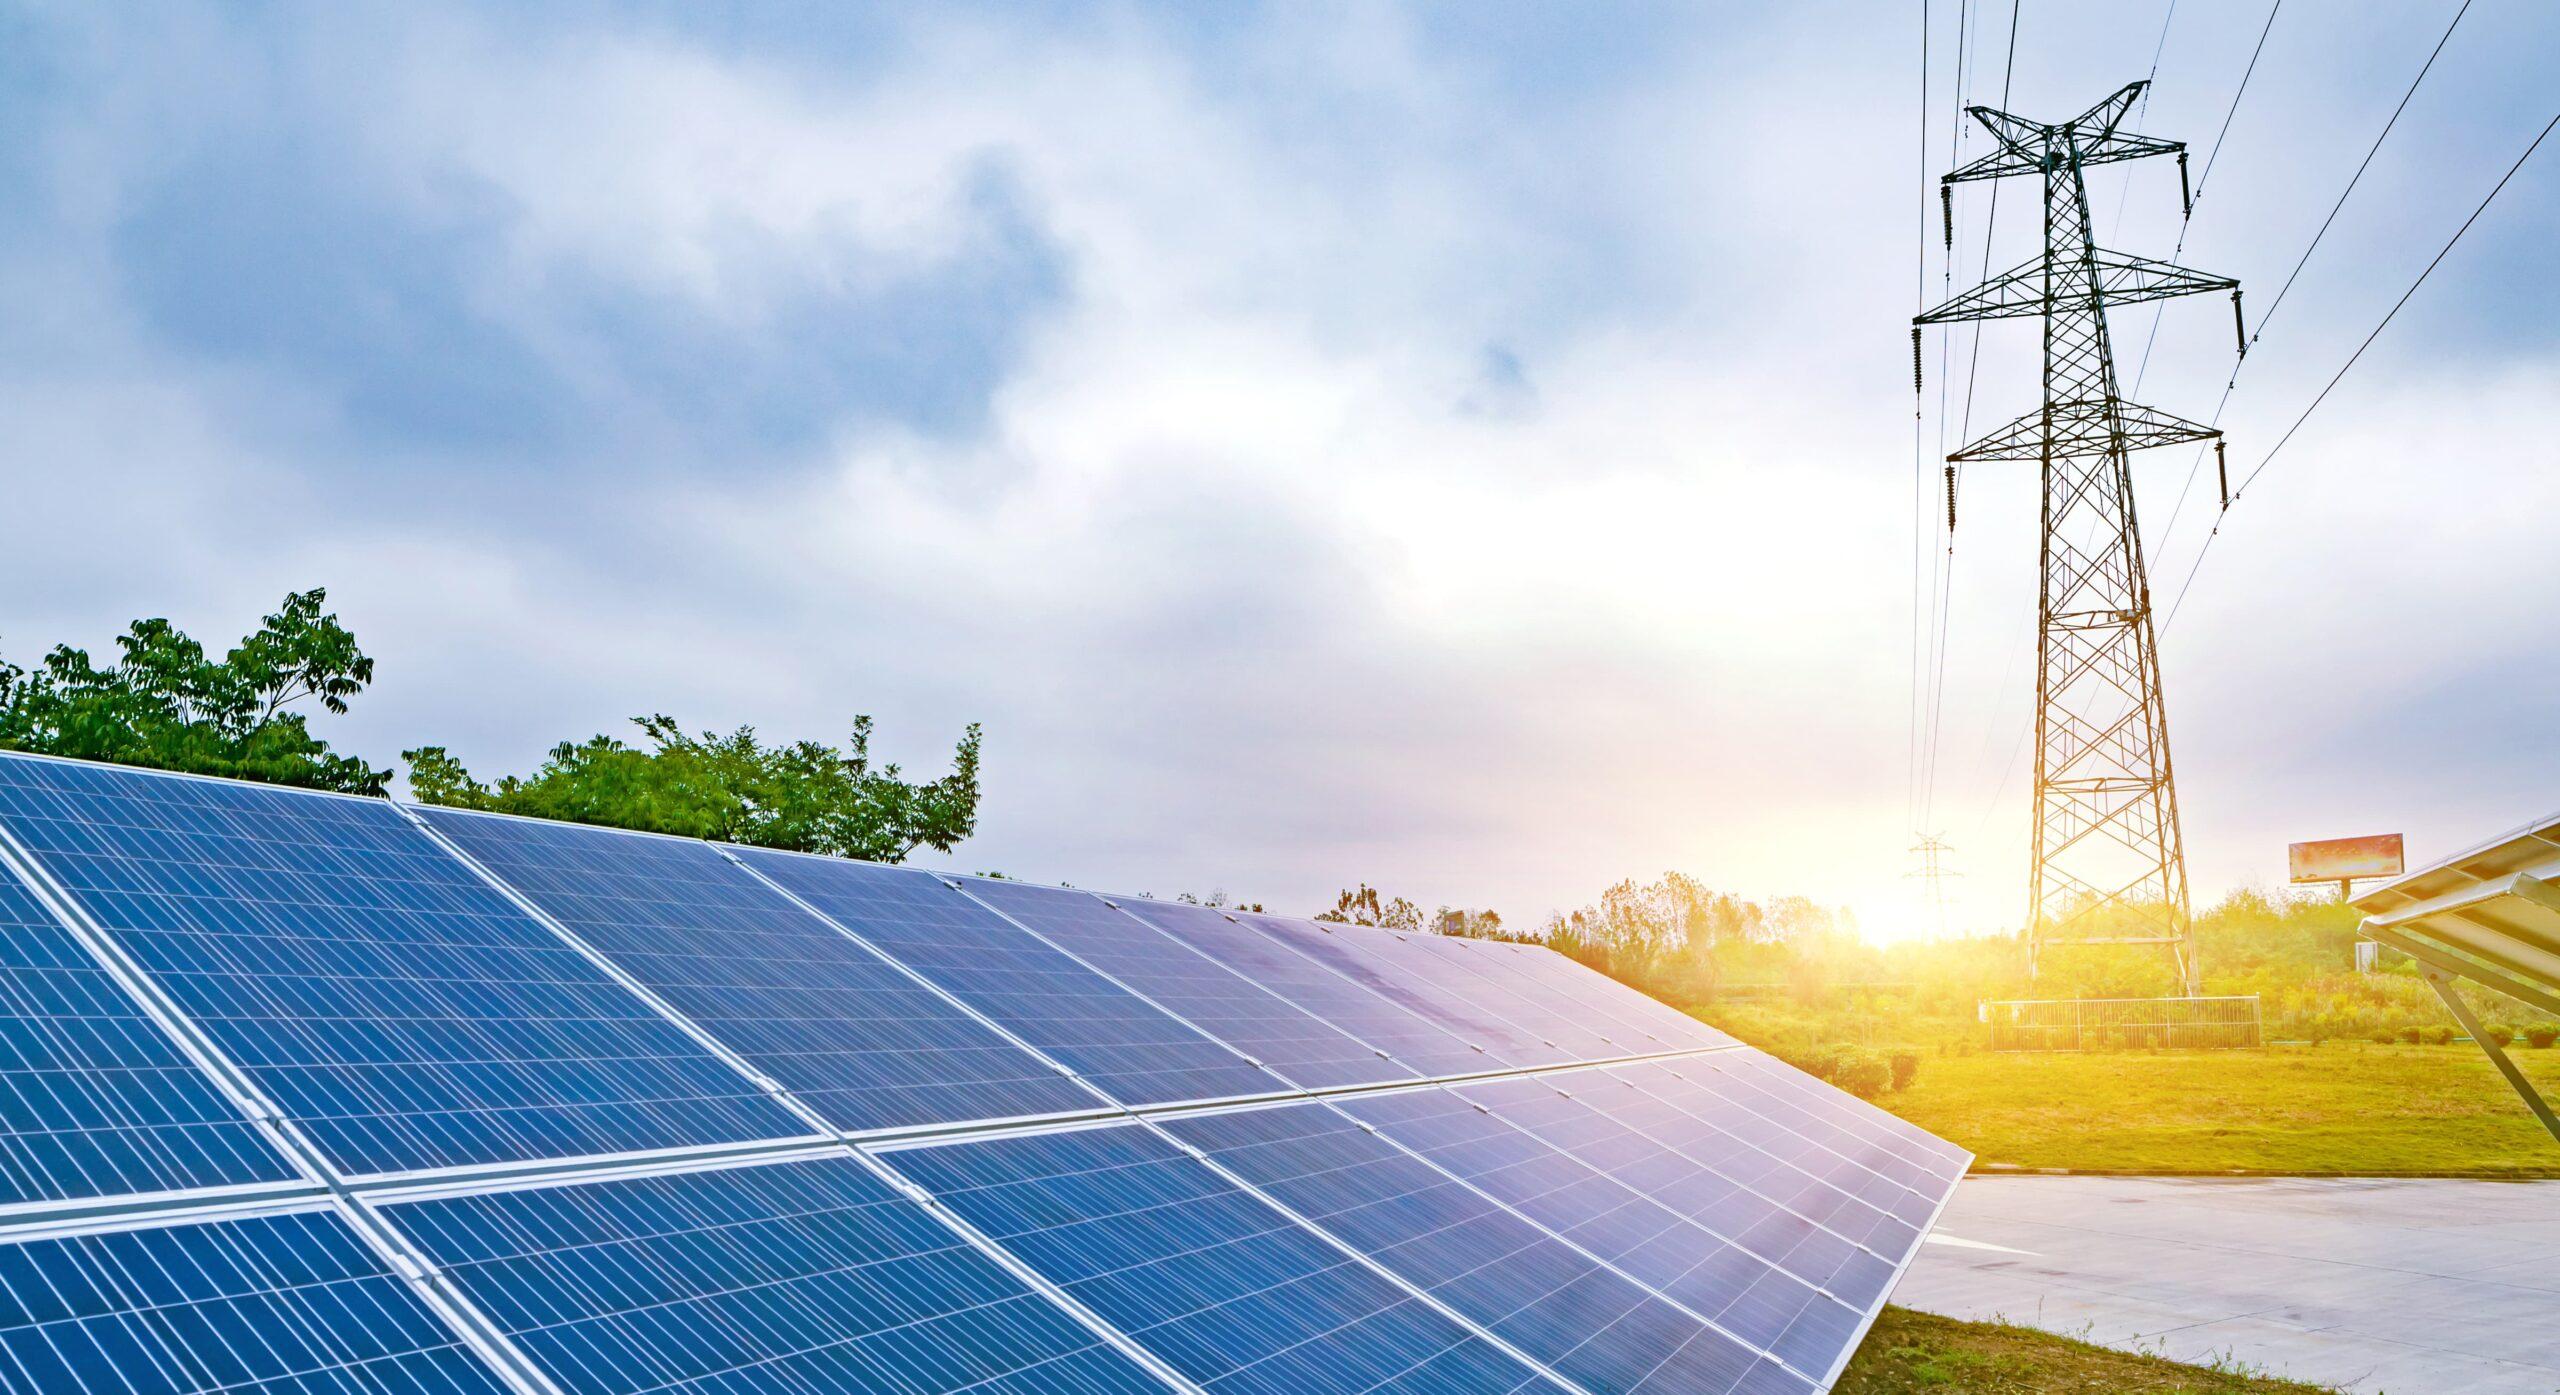 Fotovoltaïsche zonnepanelen en elektriciteitsdistributienetwerk